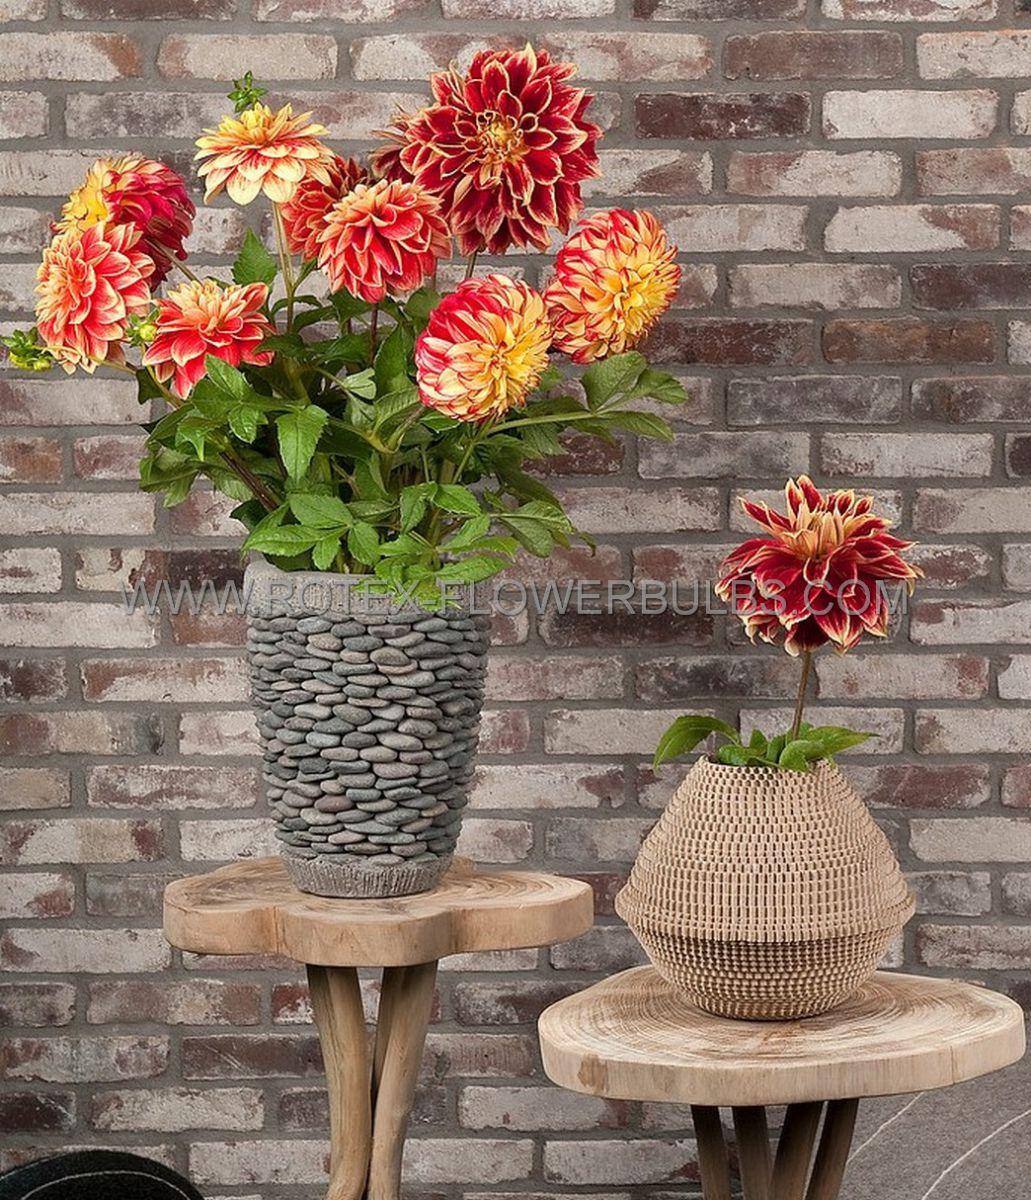 dahlia decorative karma bon bini i 25 pcarton